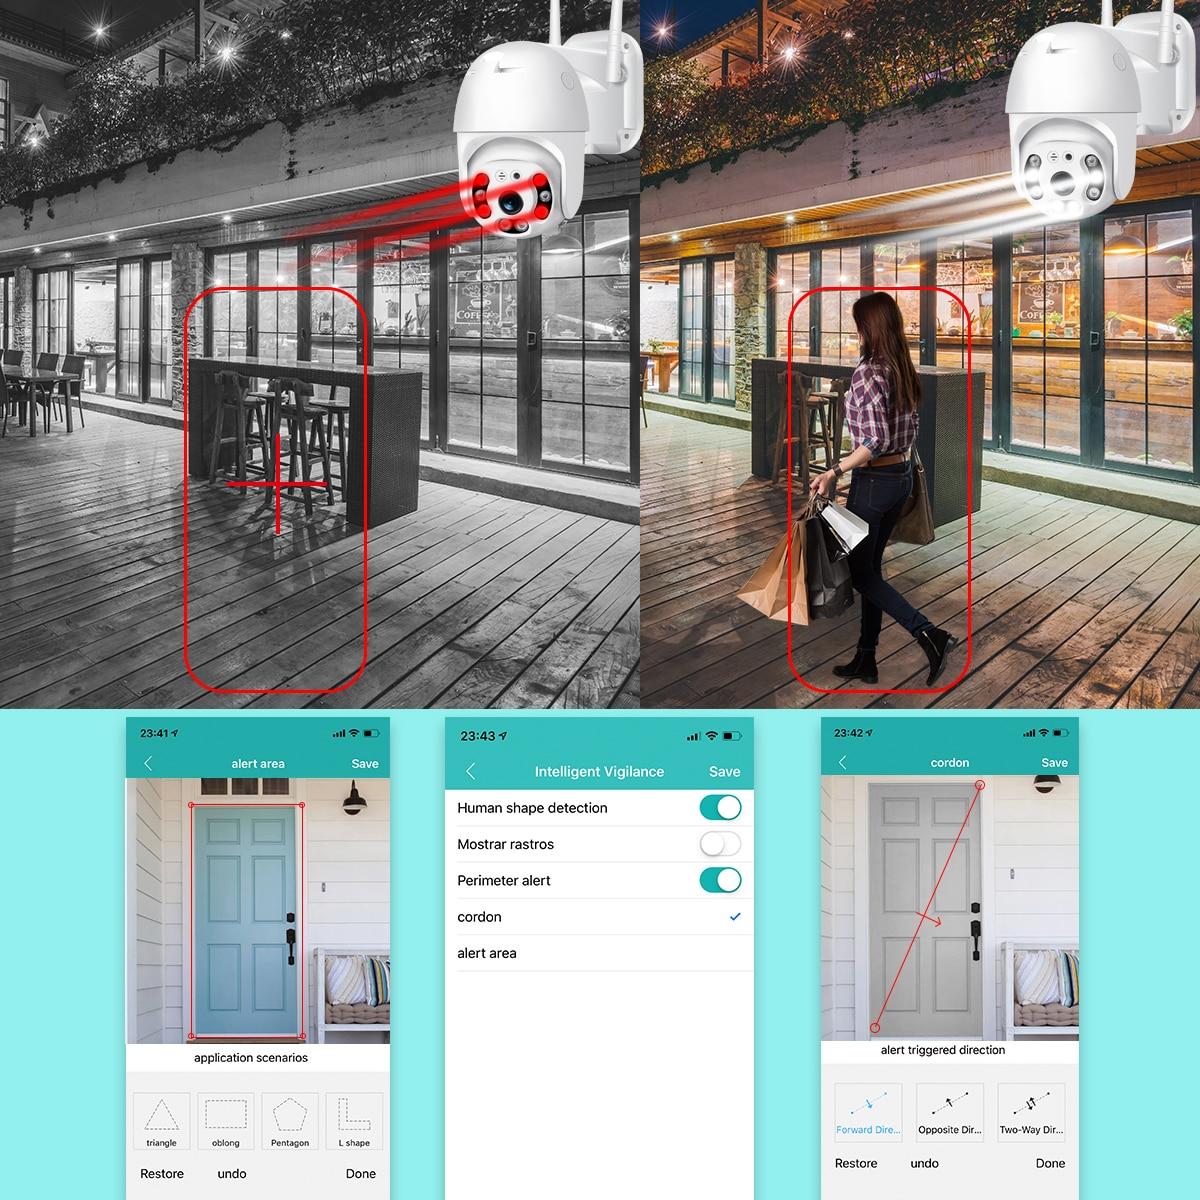 H1009c66588a74e70ab31d9e3ddc537d3v BESDER 1080P Outdoor Speed Dome Wifi Camera 2MP H.265 Audio PTZ Wireless Camera Cloud-SD Slot ONVIF Home Surveillance IP Camera